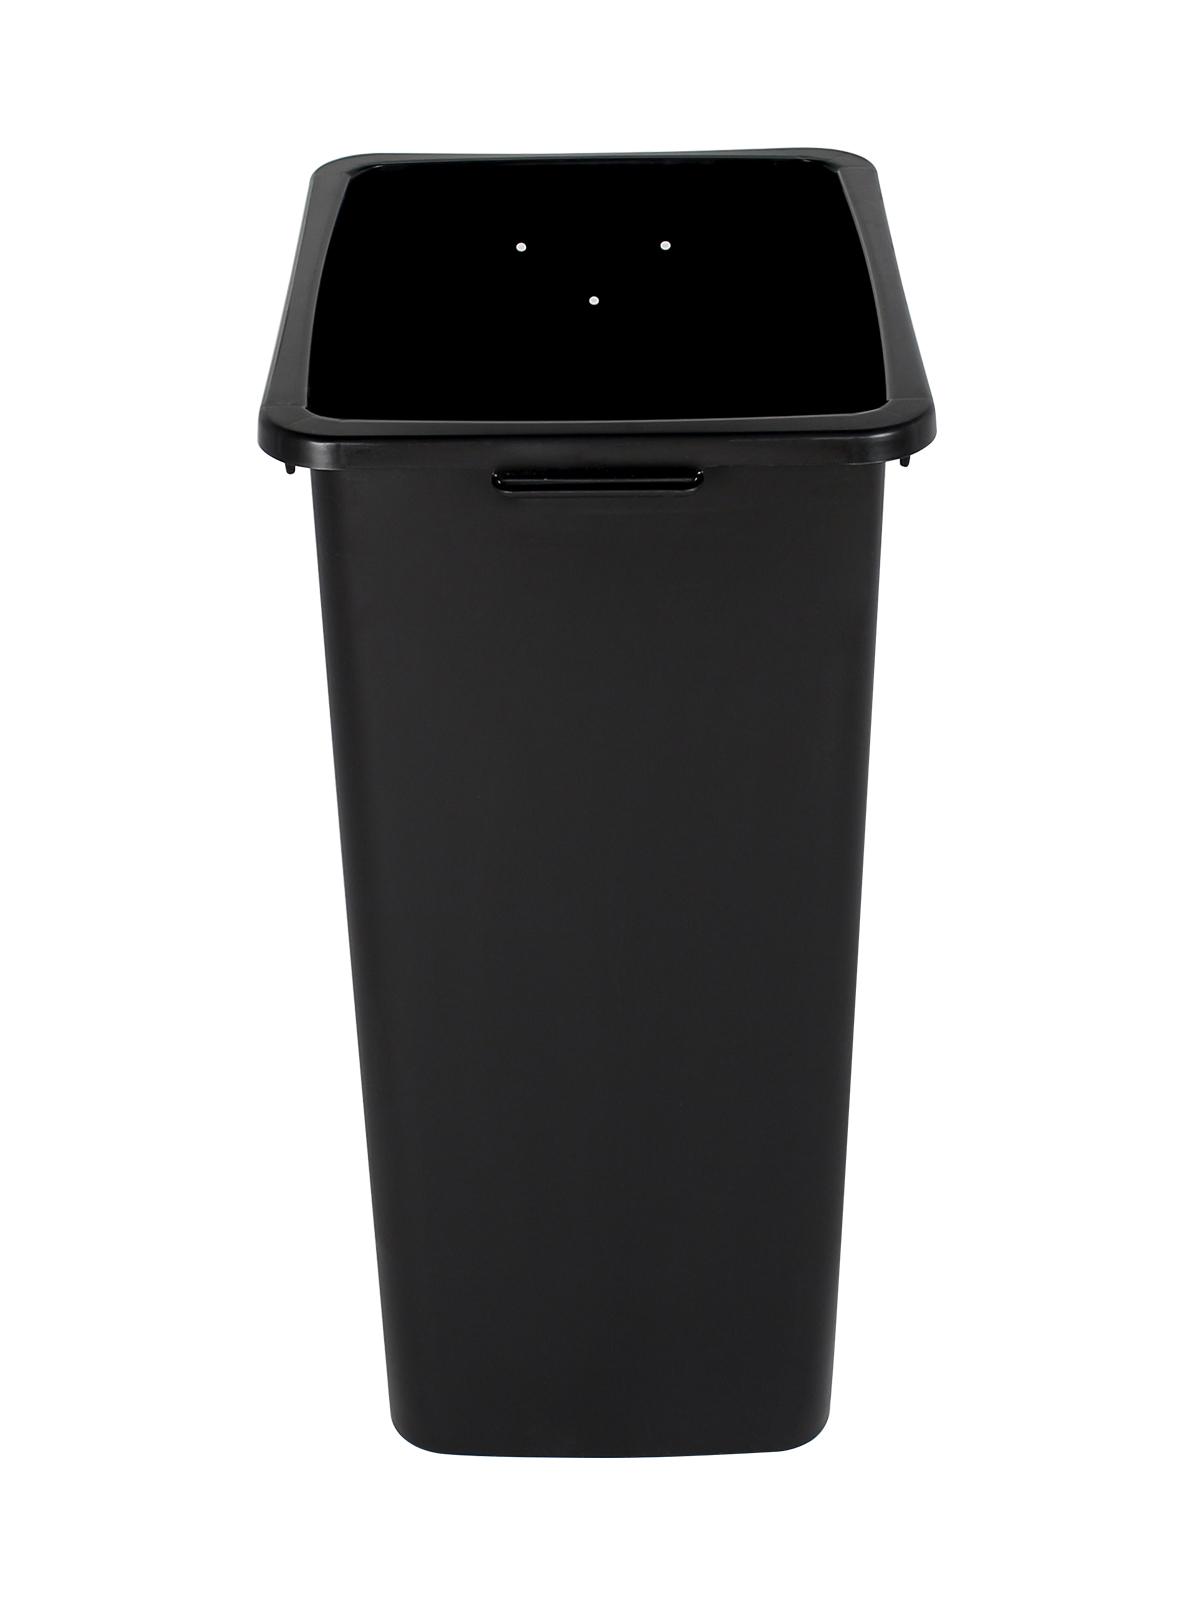 WASTE WATCHER XL - Single - Body - 30 - Black